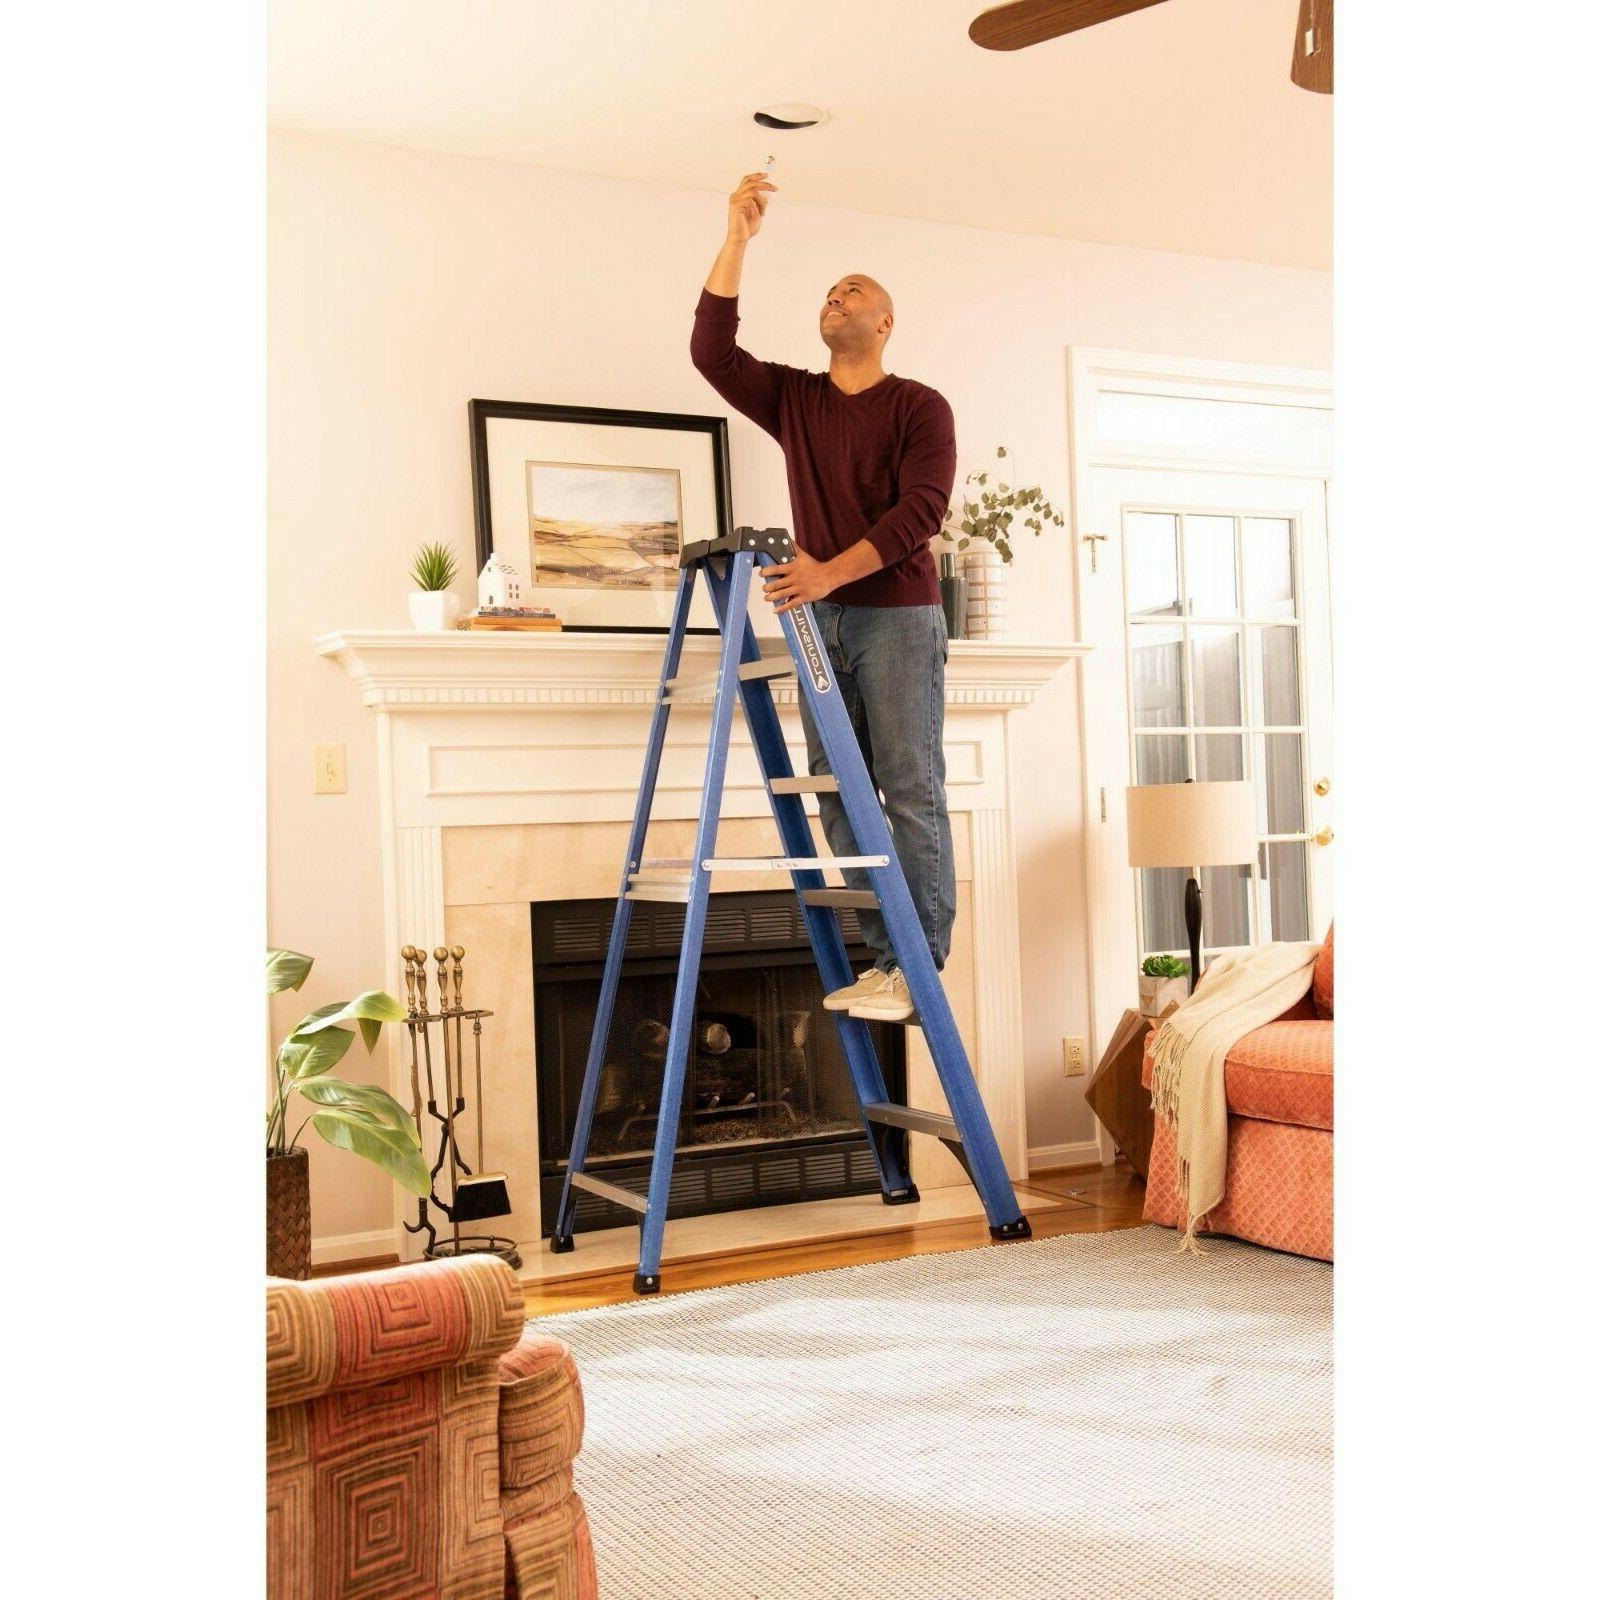 Ladder 6-Foot Ladder, Capacity, II